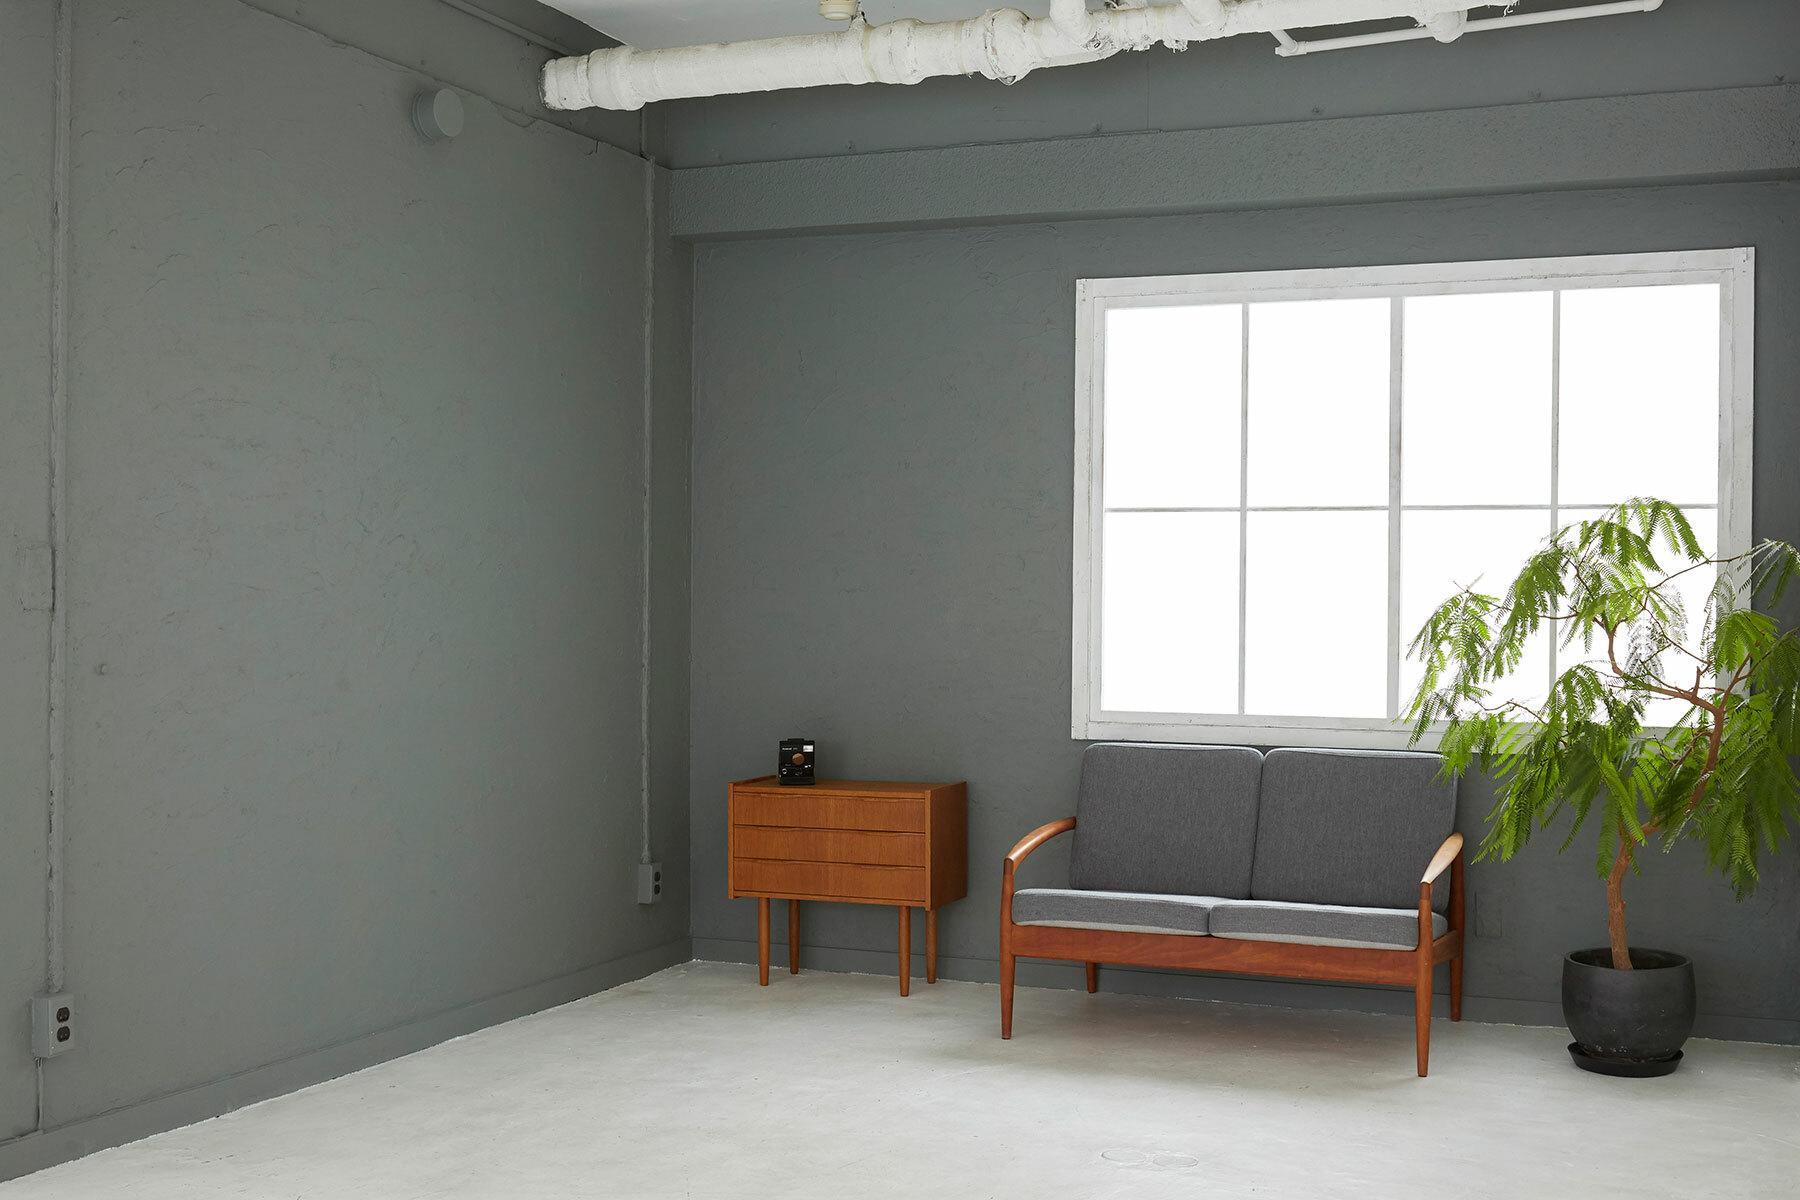 FIVE STUDIO (ファイブ スタジオ)壁板を外して床に敷いています。